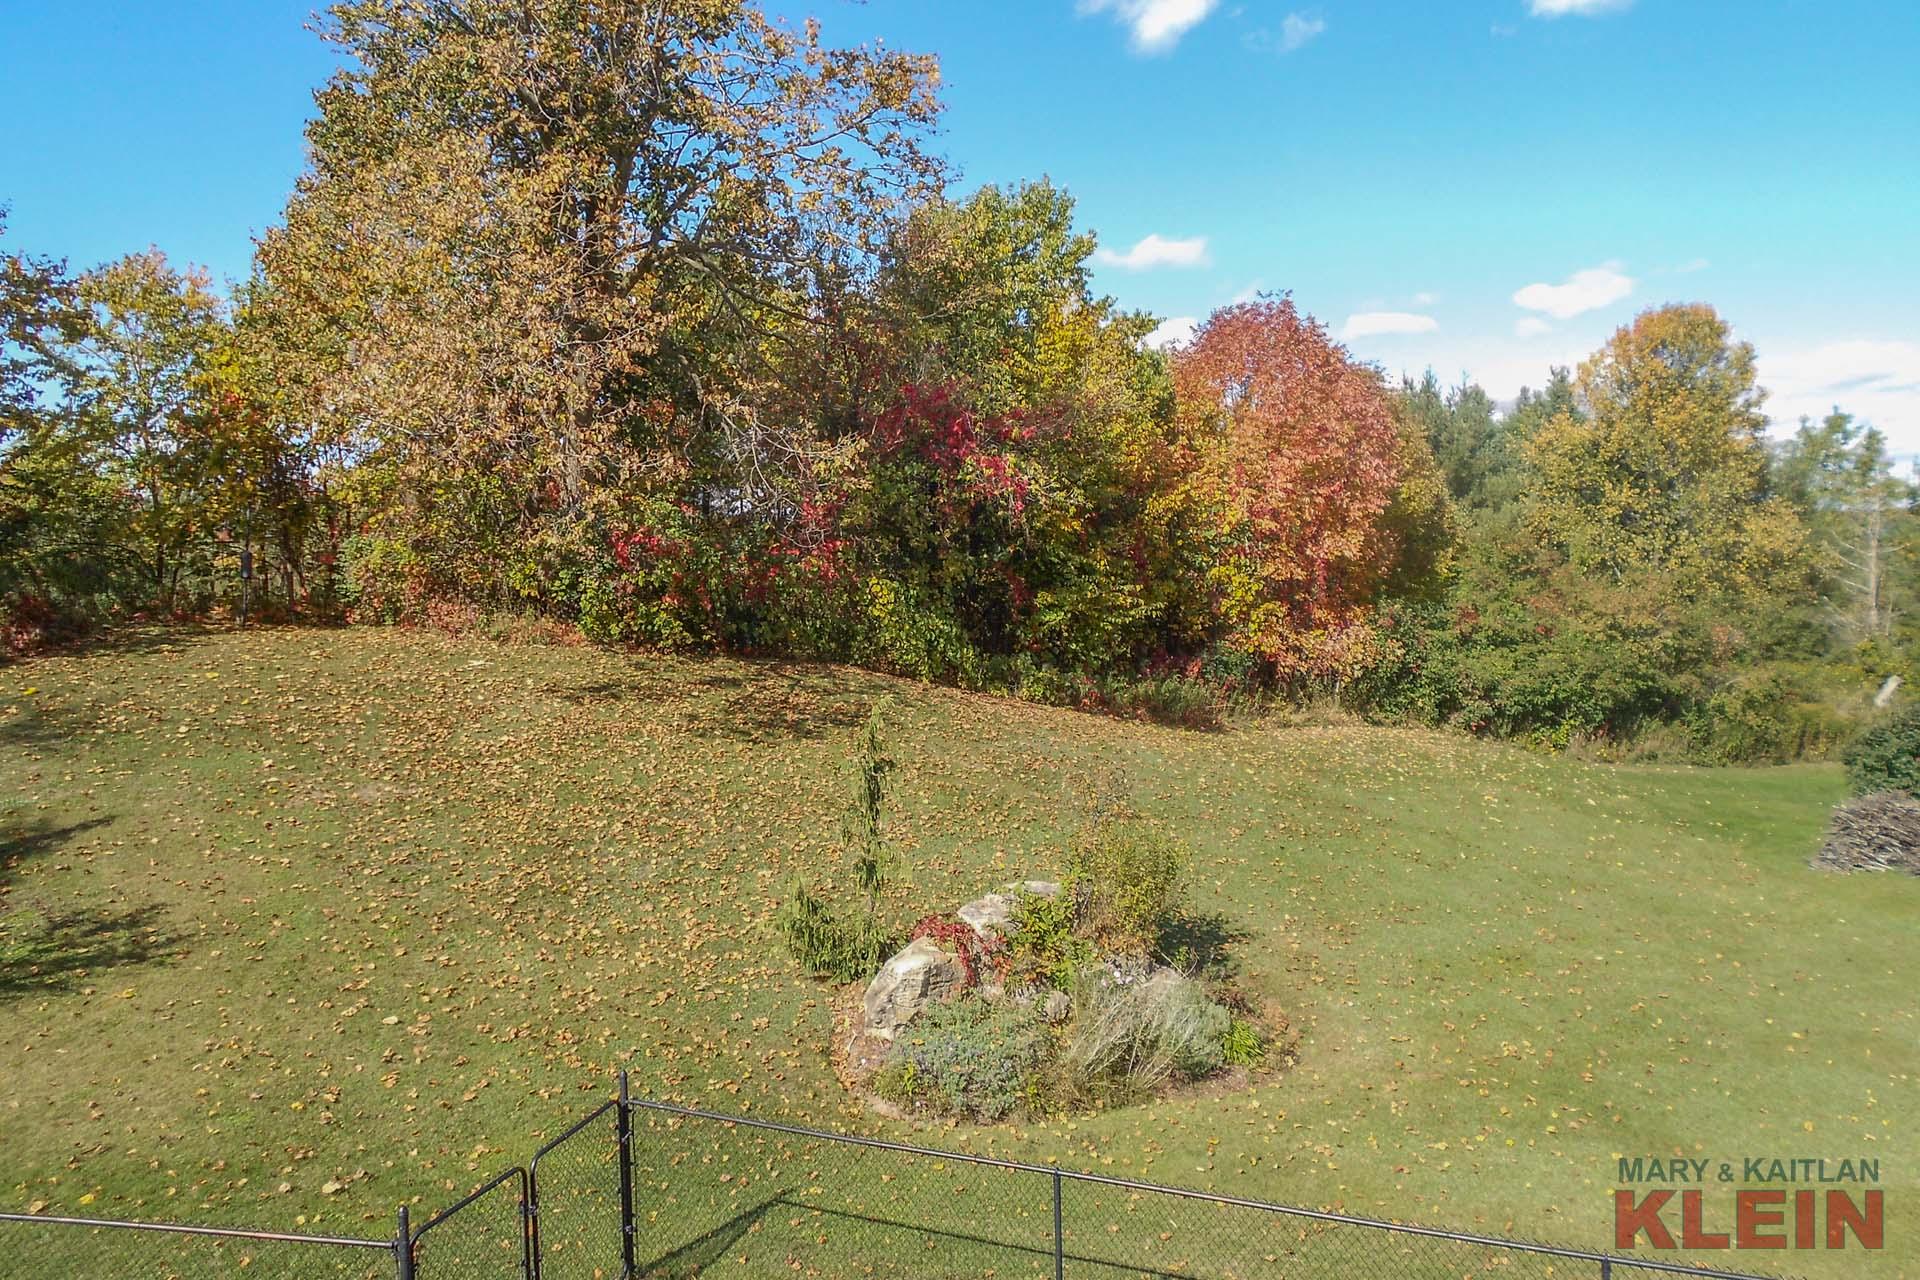 Views of the Backyard